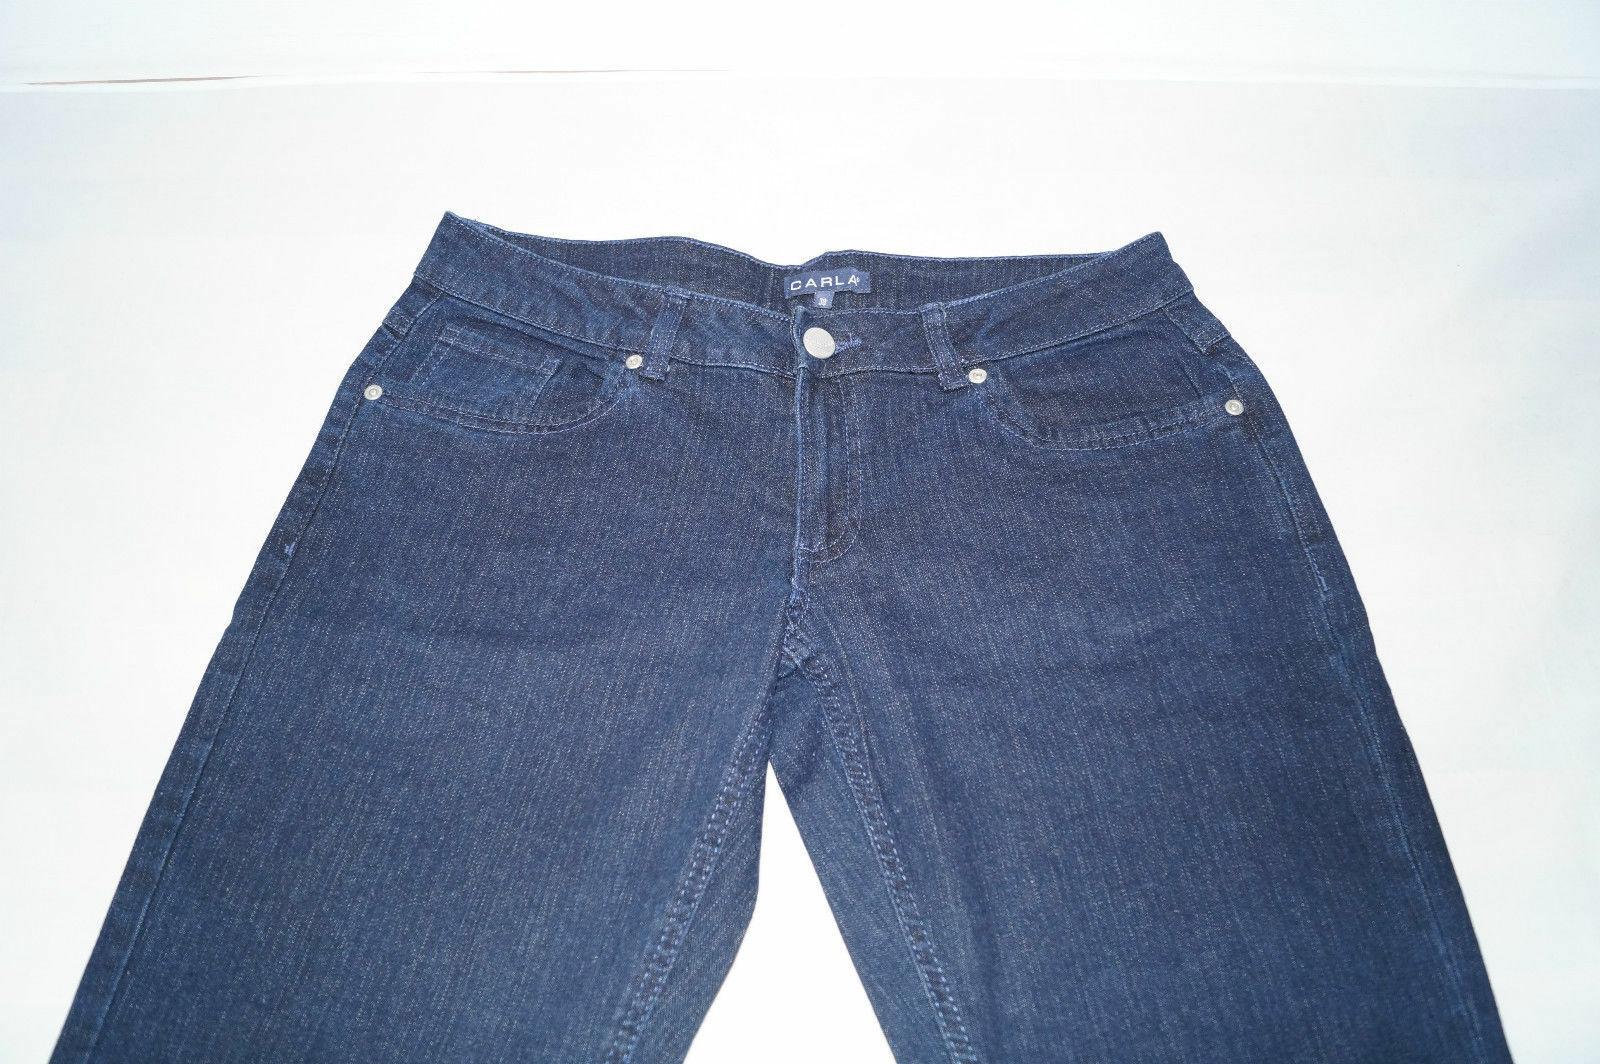 Damen-Stretch-Jeans-9-versch-Modelle-Jeanshose-Hose-Elasthan-bequem-Oko-Tex Indexbild 17